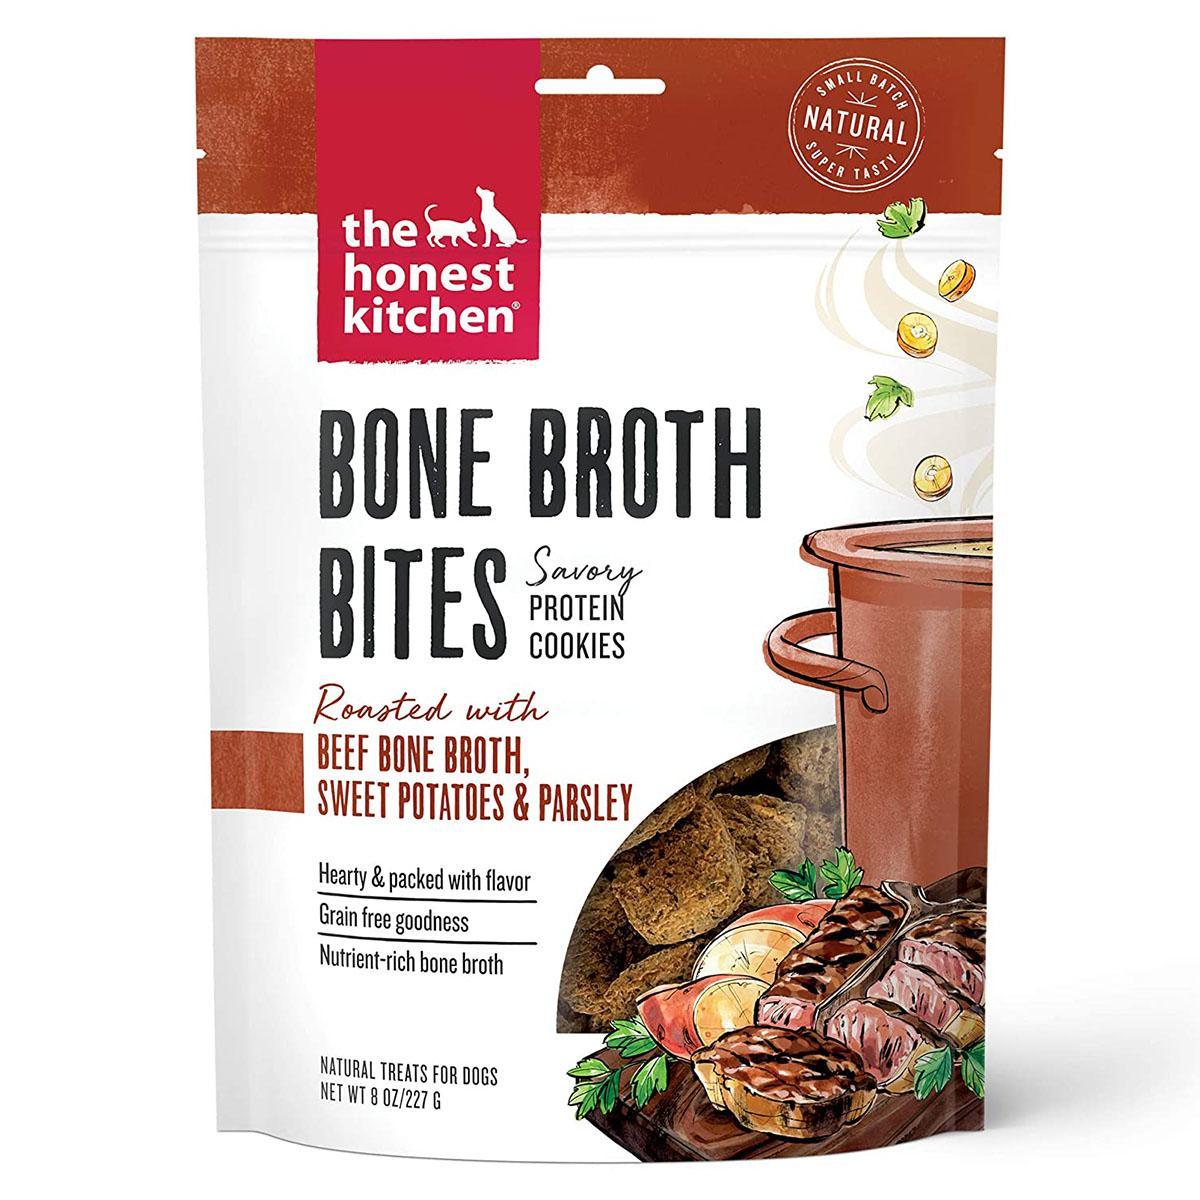 The Honest Kitchen Bone Broth Bites Dog Treats - Beef Bone Broth, Sweet Potatoes & Parsley Recipe